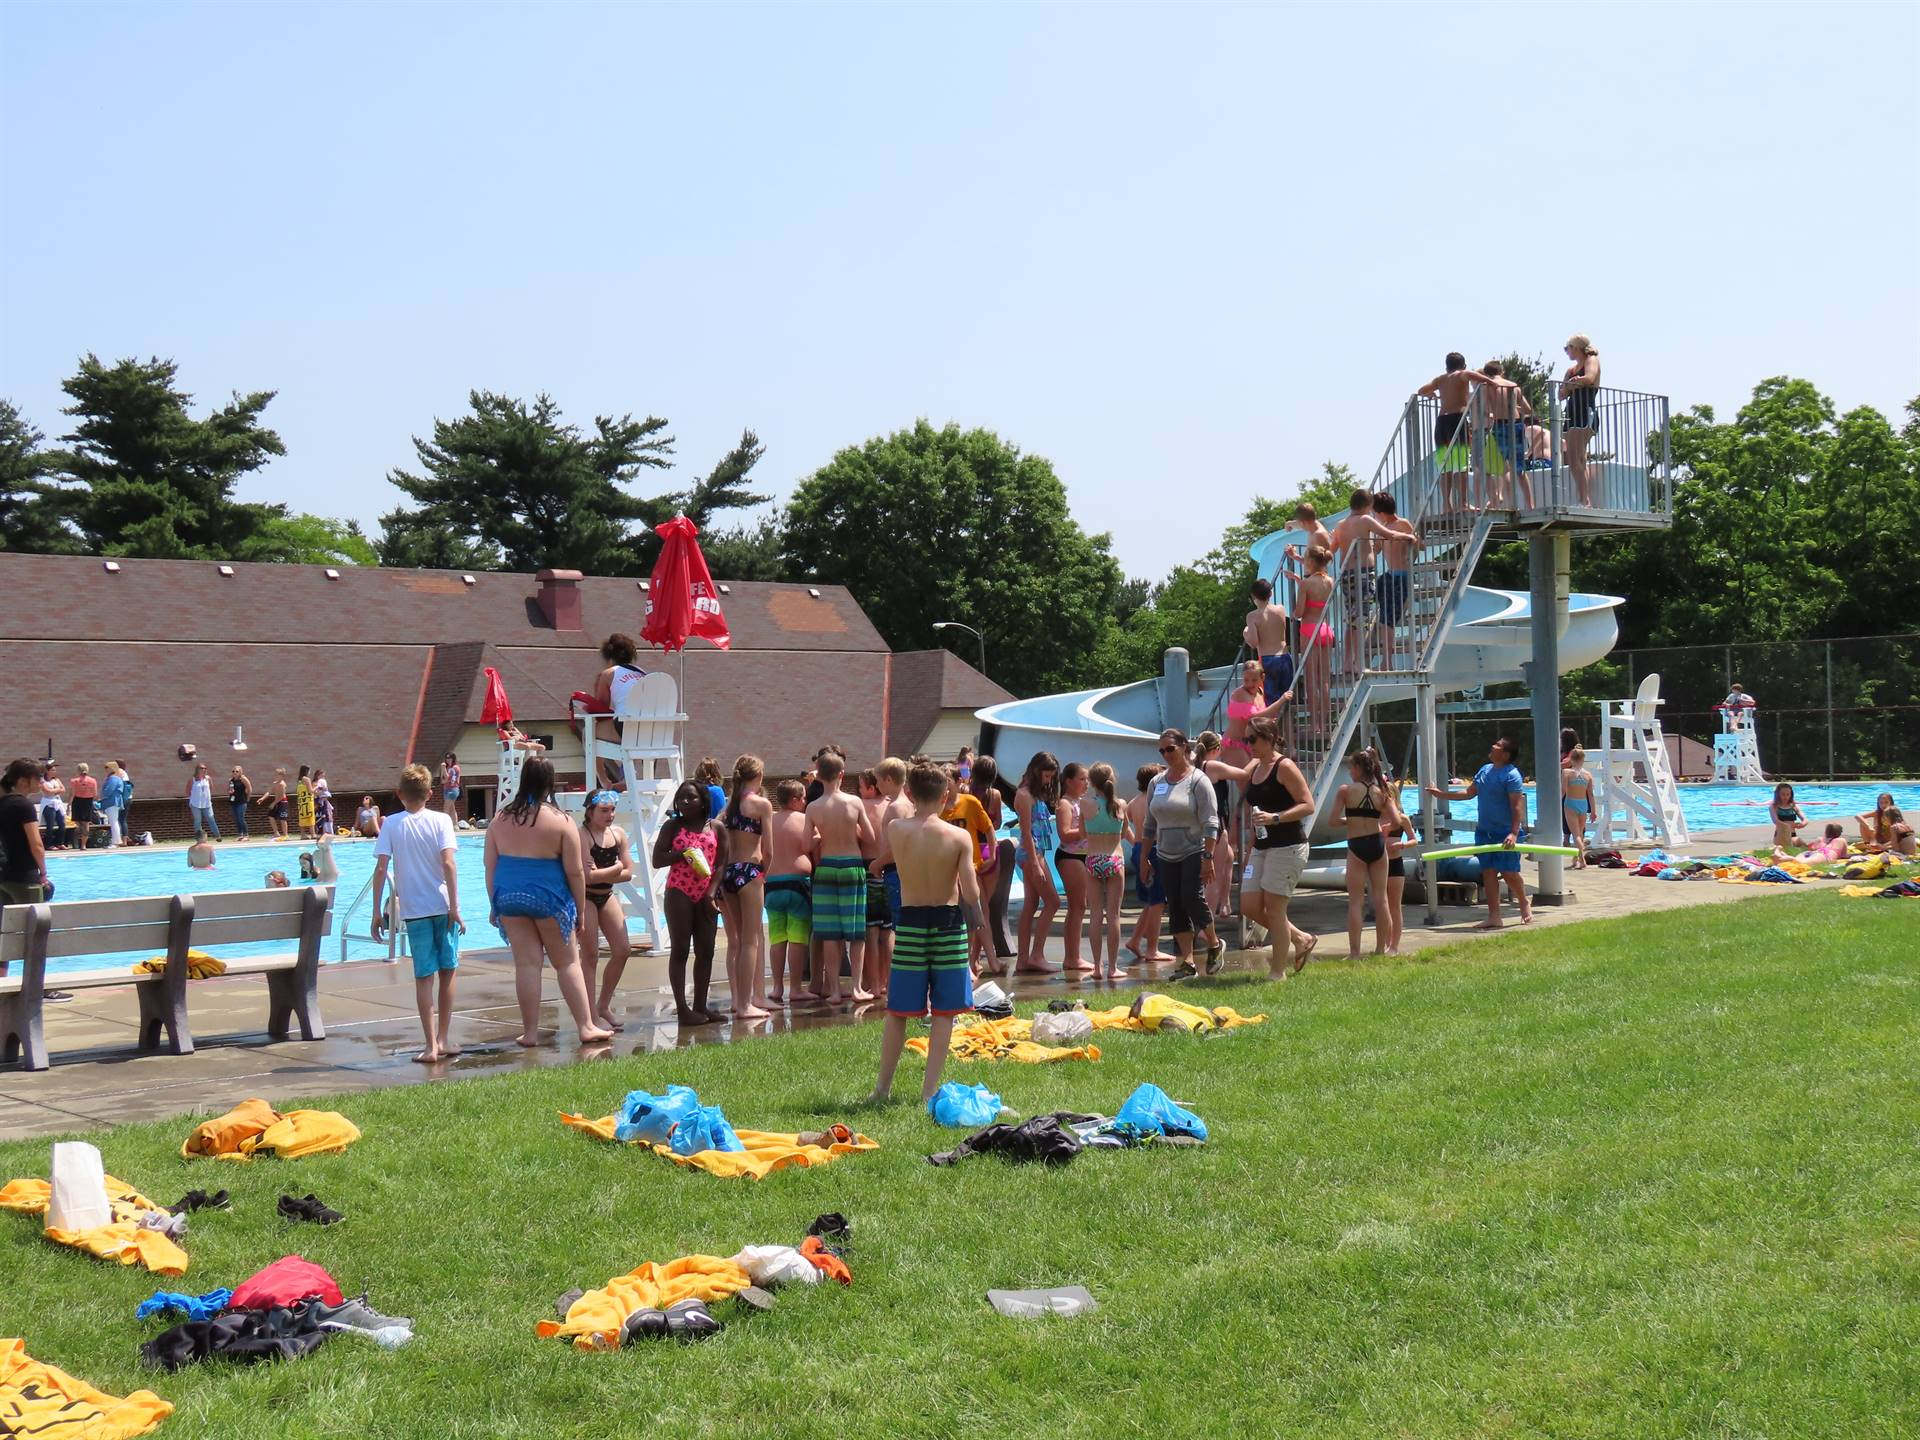 Kids waiting their turn in line for pool slide